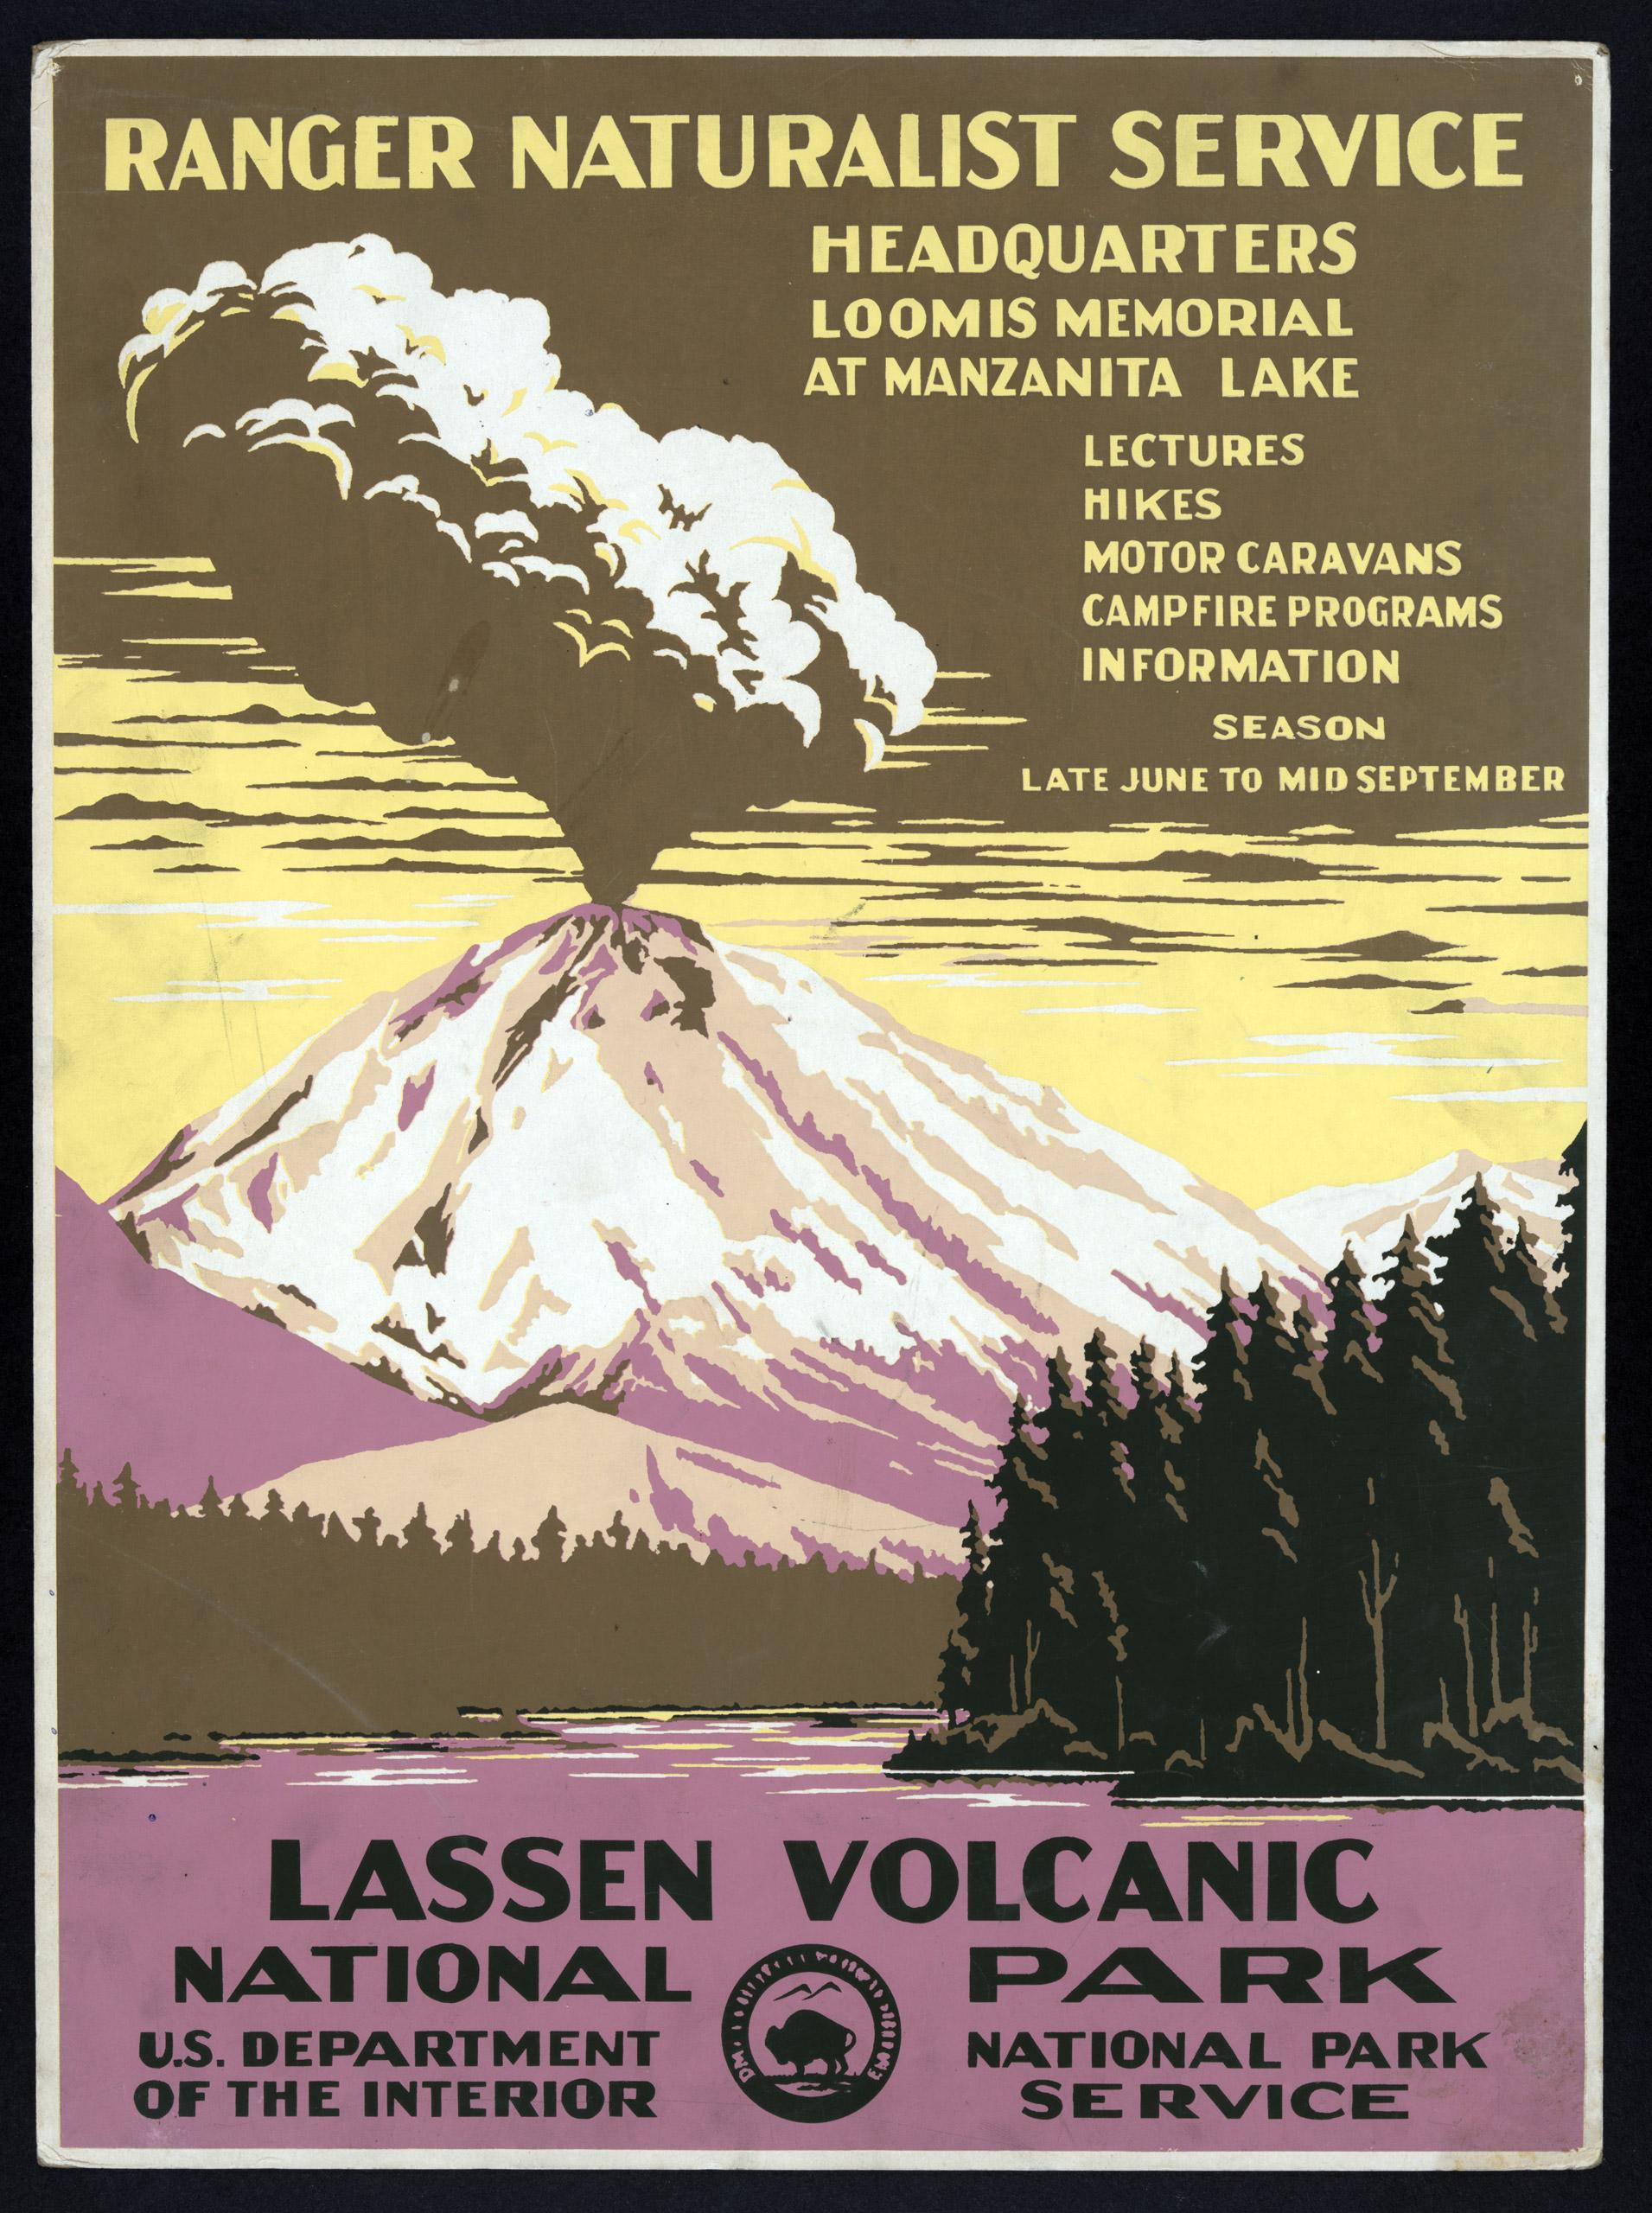 Lassen Volcanic National Park, Ranger Naturalist Service, ca. 1938.